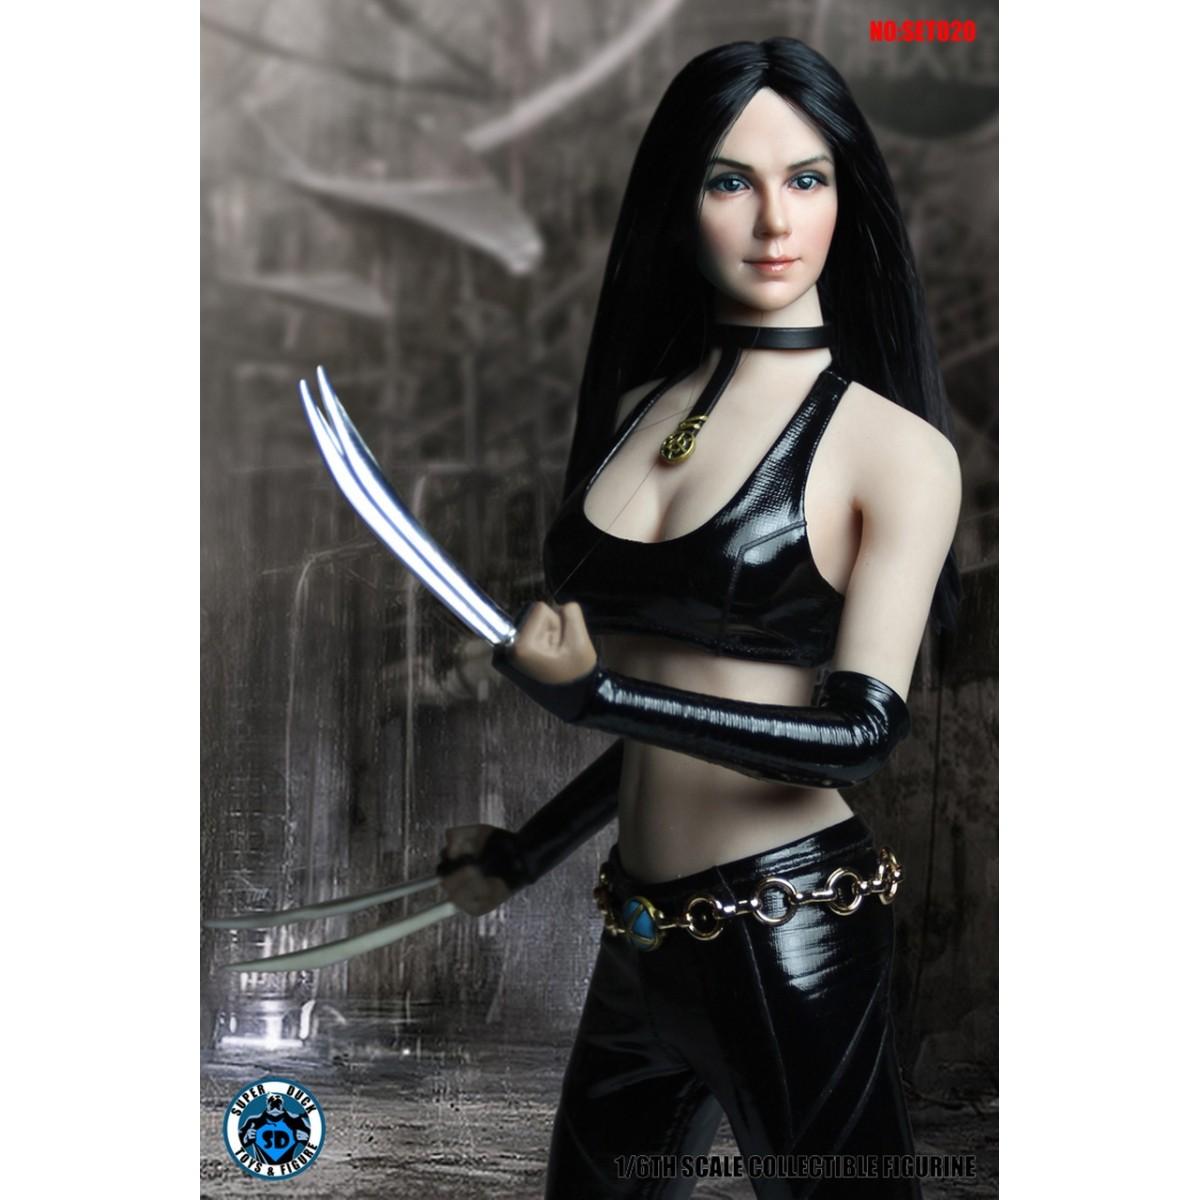 PRÉ VENDA: Boneco X-23 (Wolf Lady): Marvel Cosplay Series 020 Escala 1/6 - Super Duck